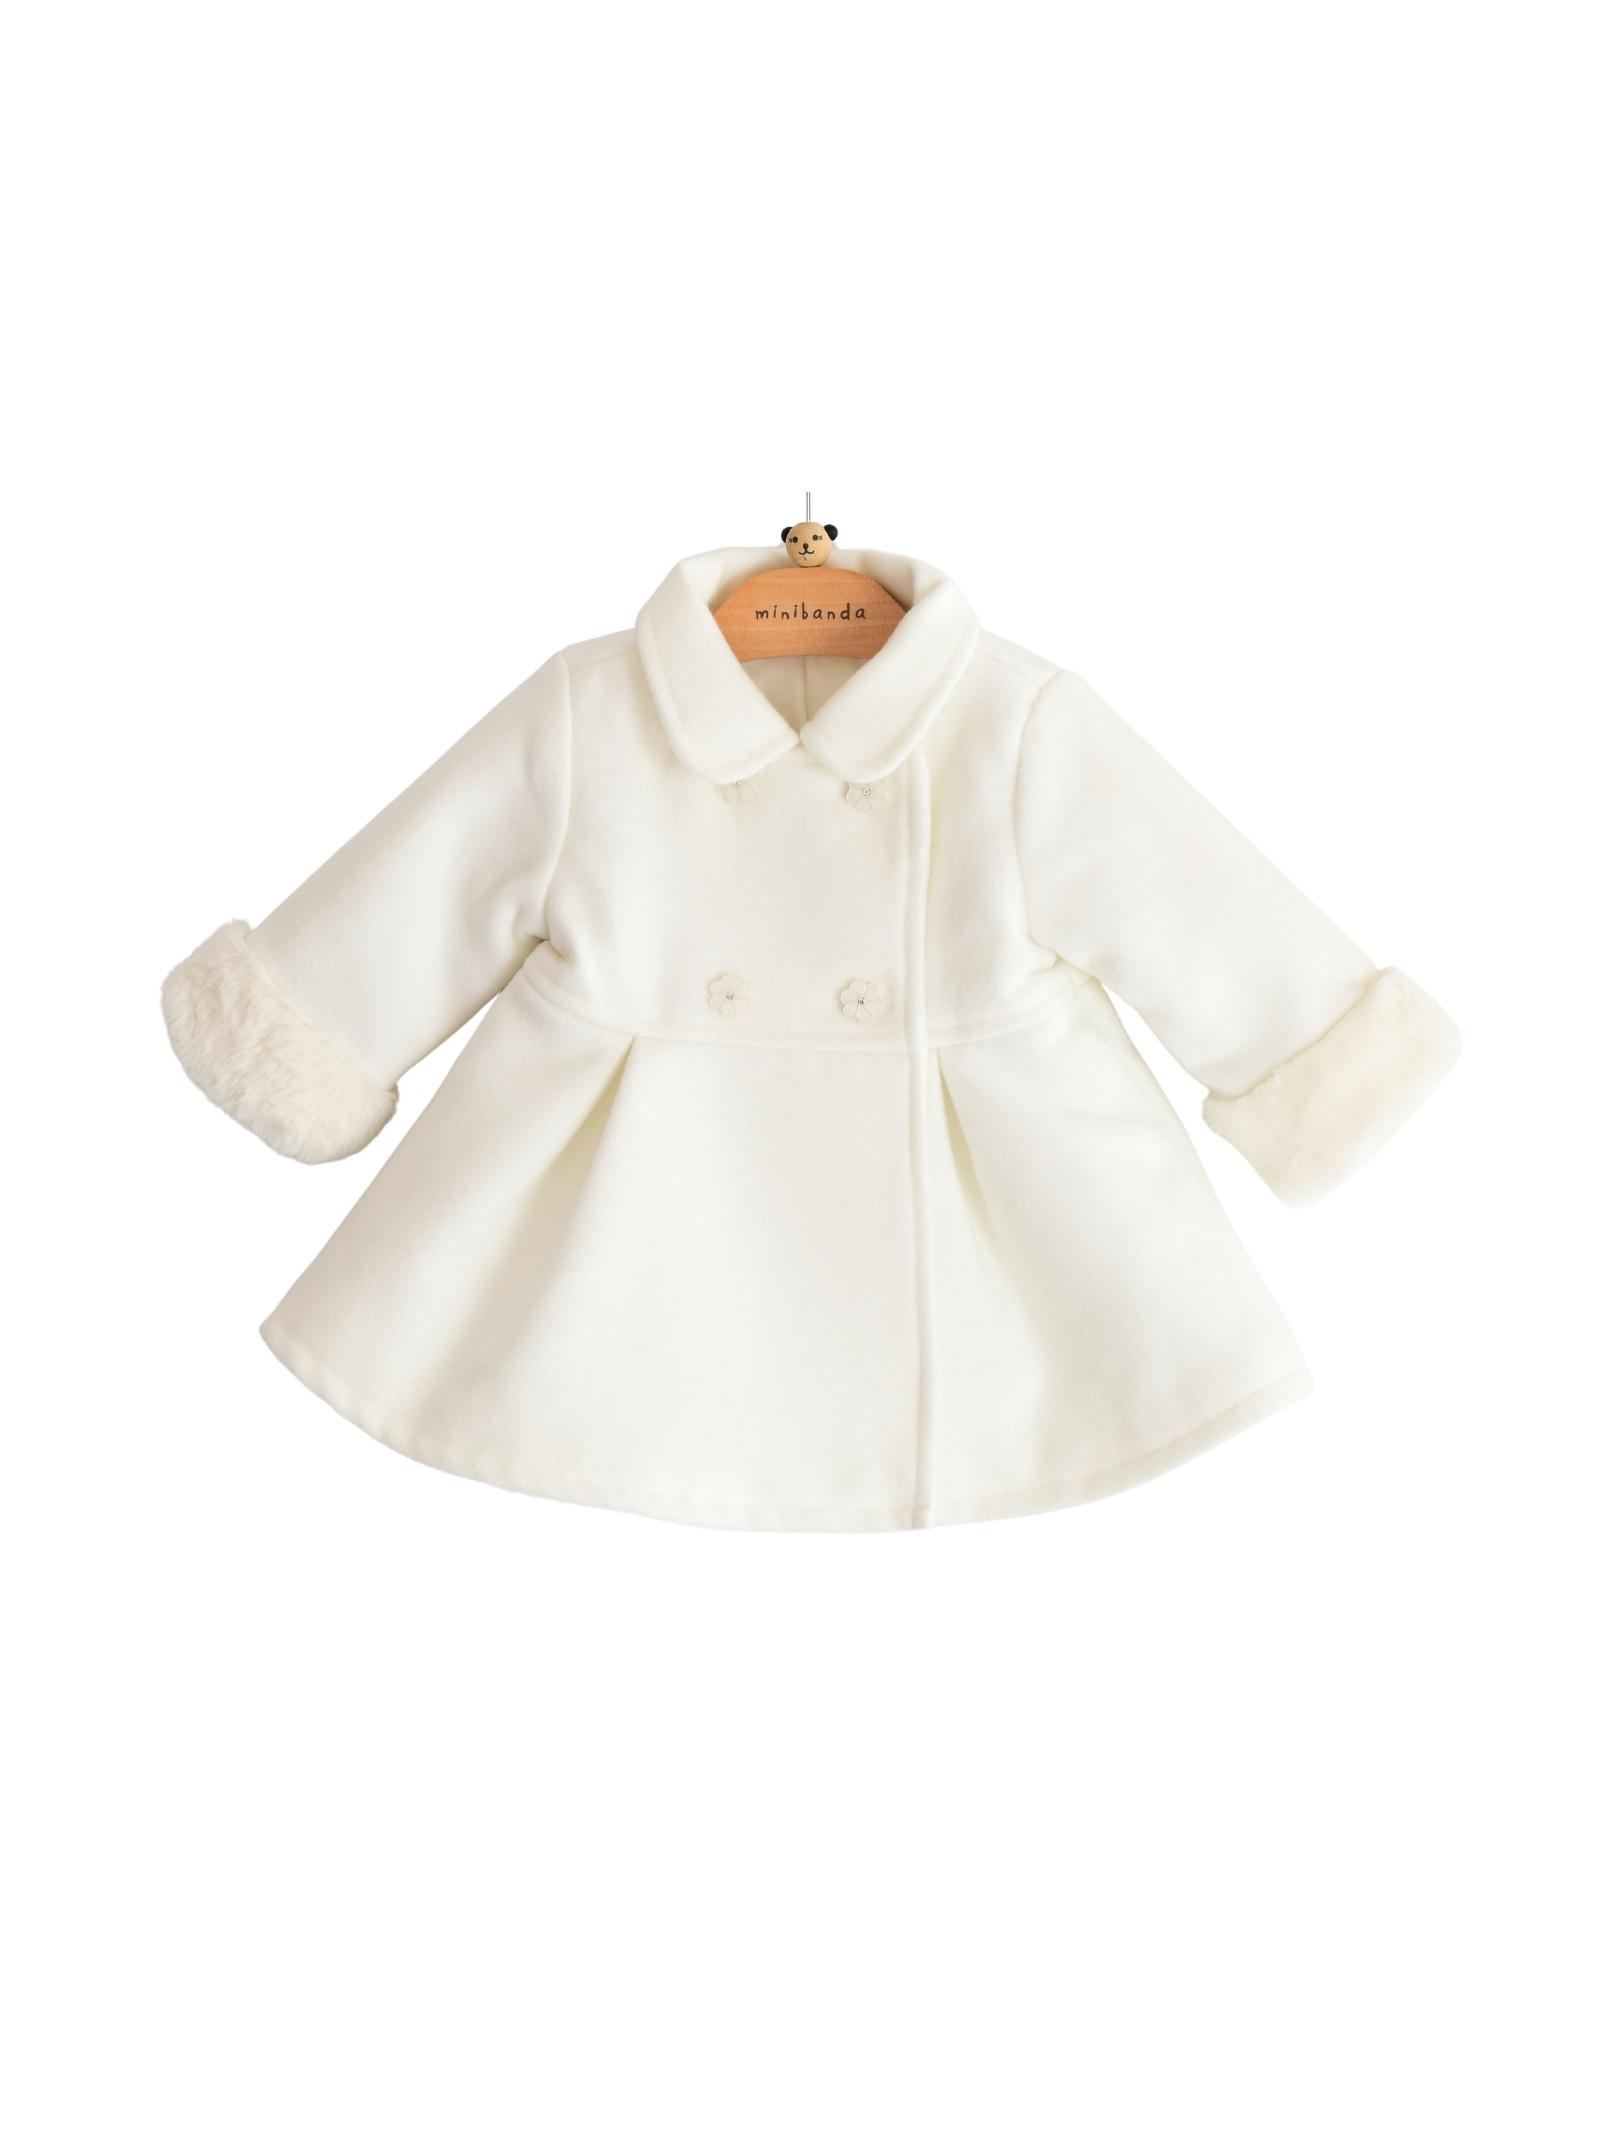 Double-Breasted Coat for Girls MINIBANDA | Coats | 33761000112